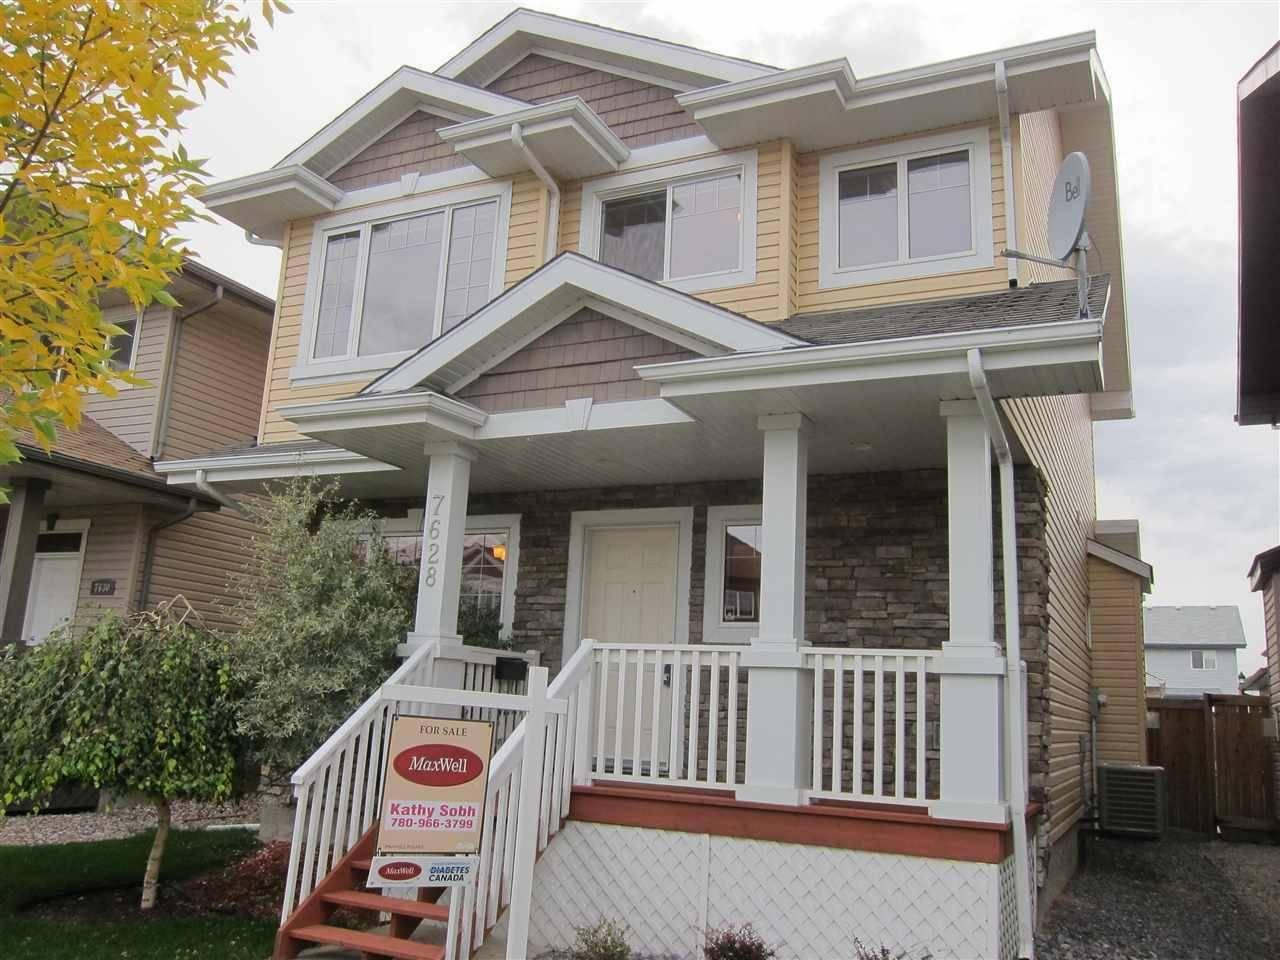 House for sale at 7628 Schmid Cres Nw Edmonton Alberta - MLS: E4174763